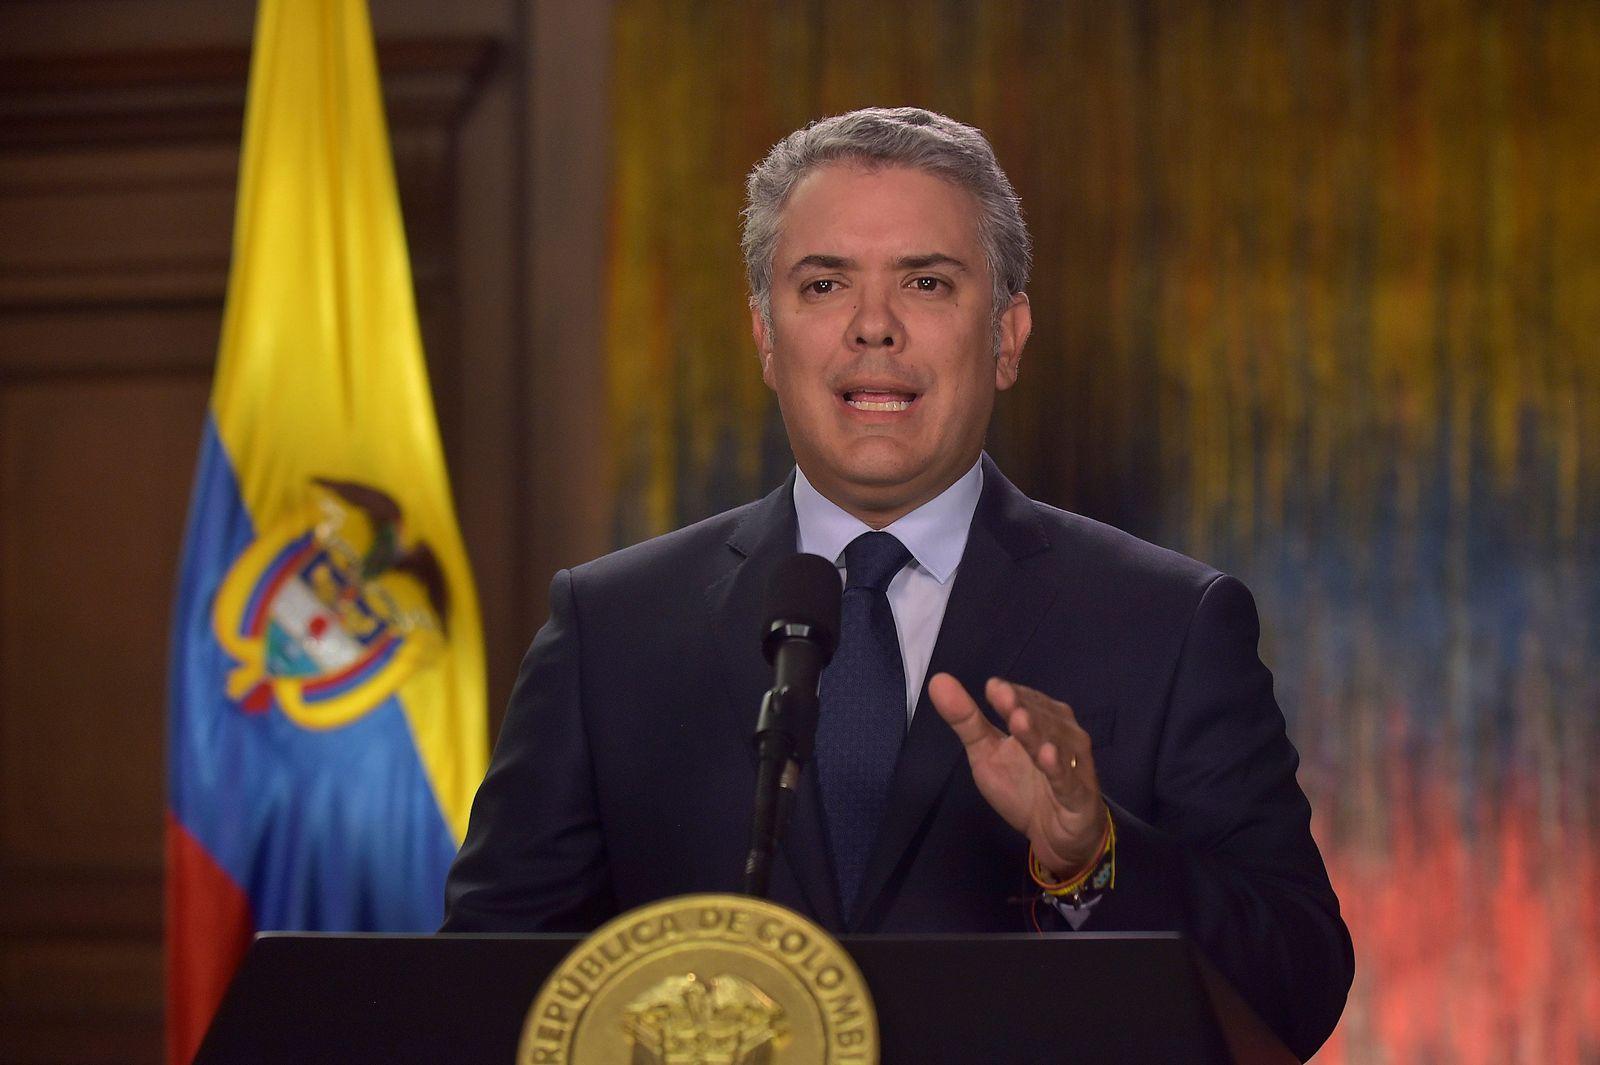 COLOMBIA-BLAST/